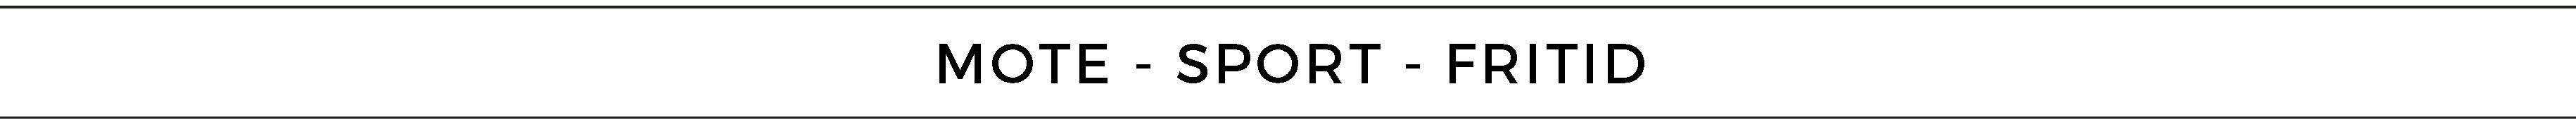 Mote - Sport - Fritid